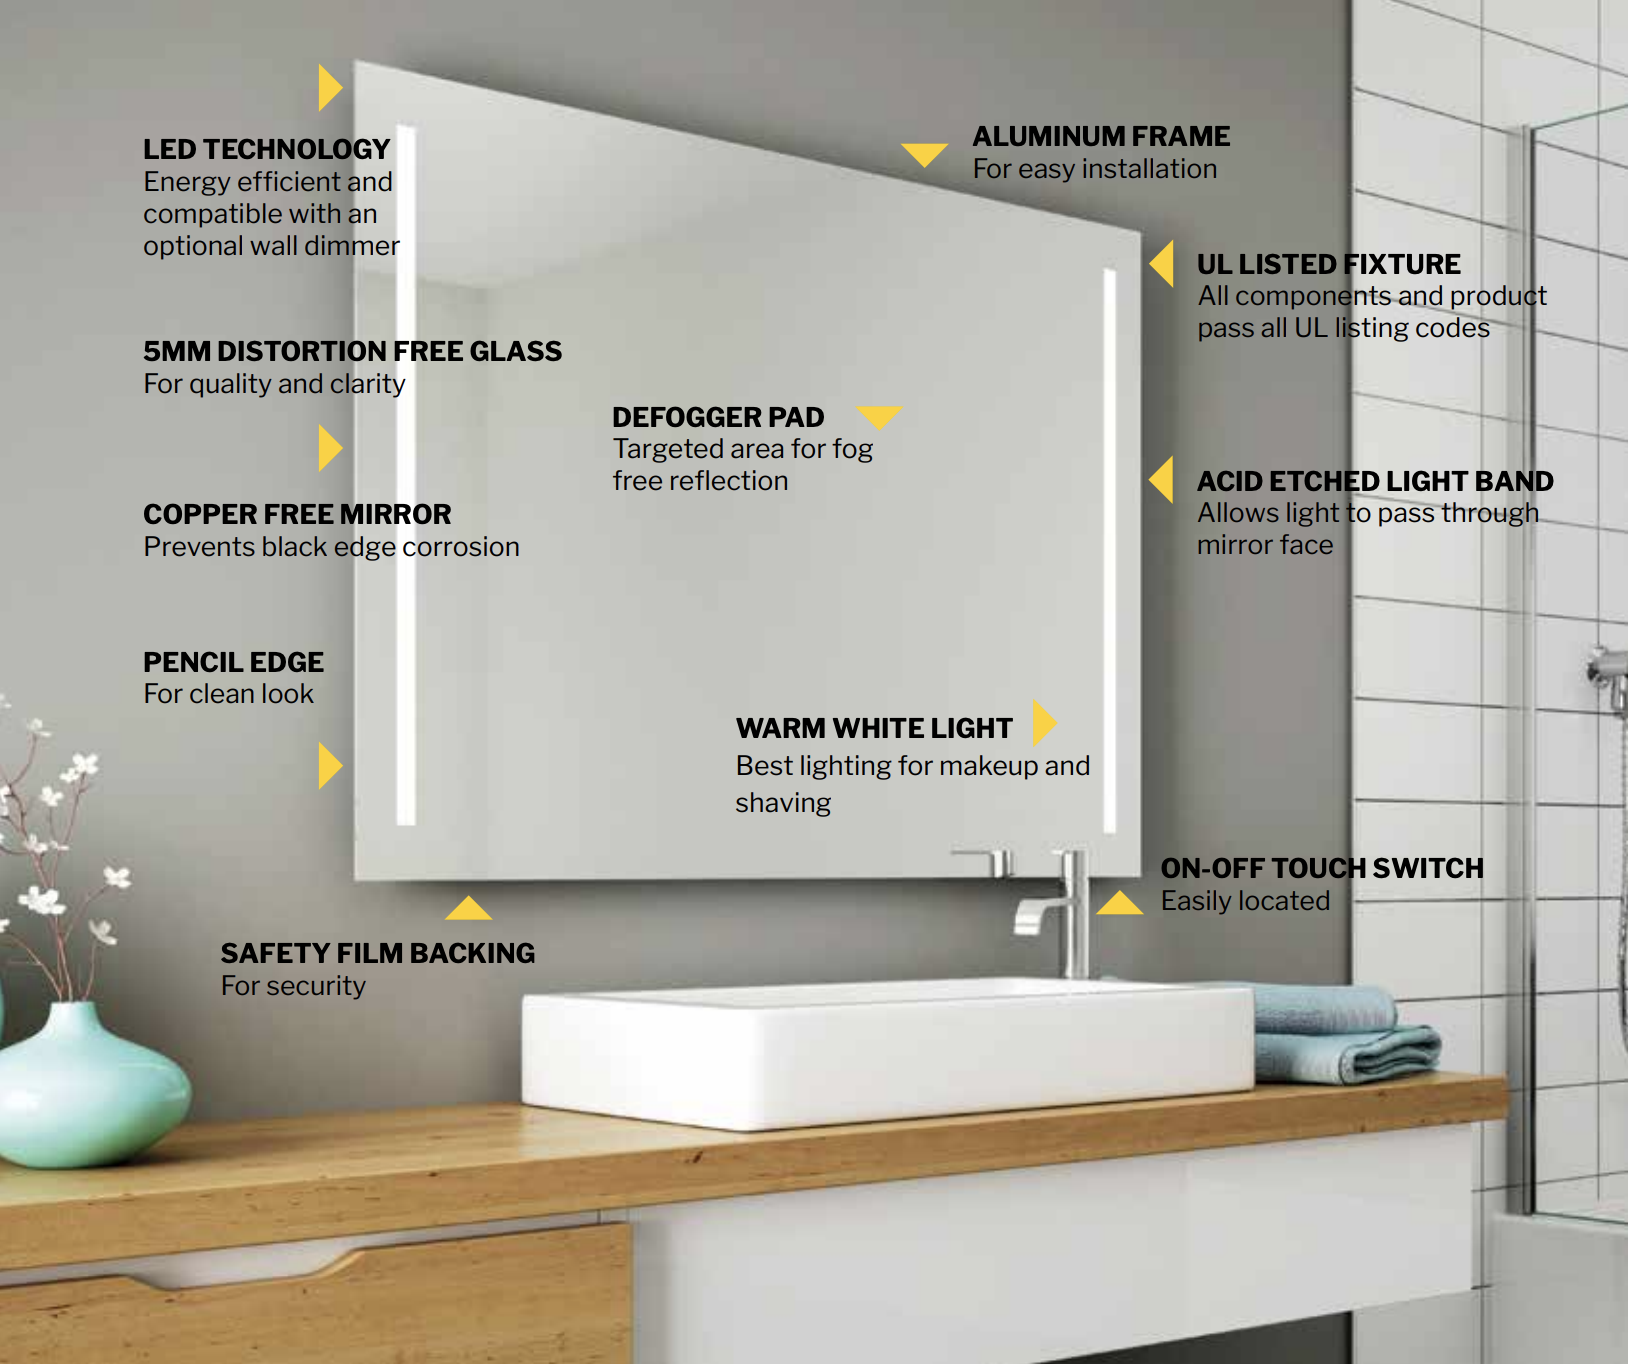 benefits of Fluerco Luna mirrors